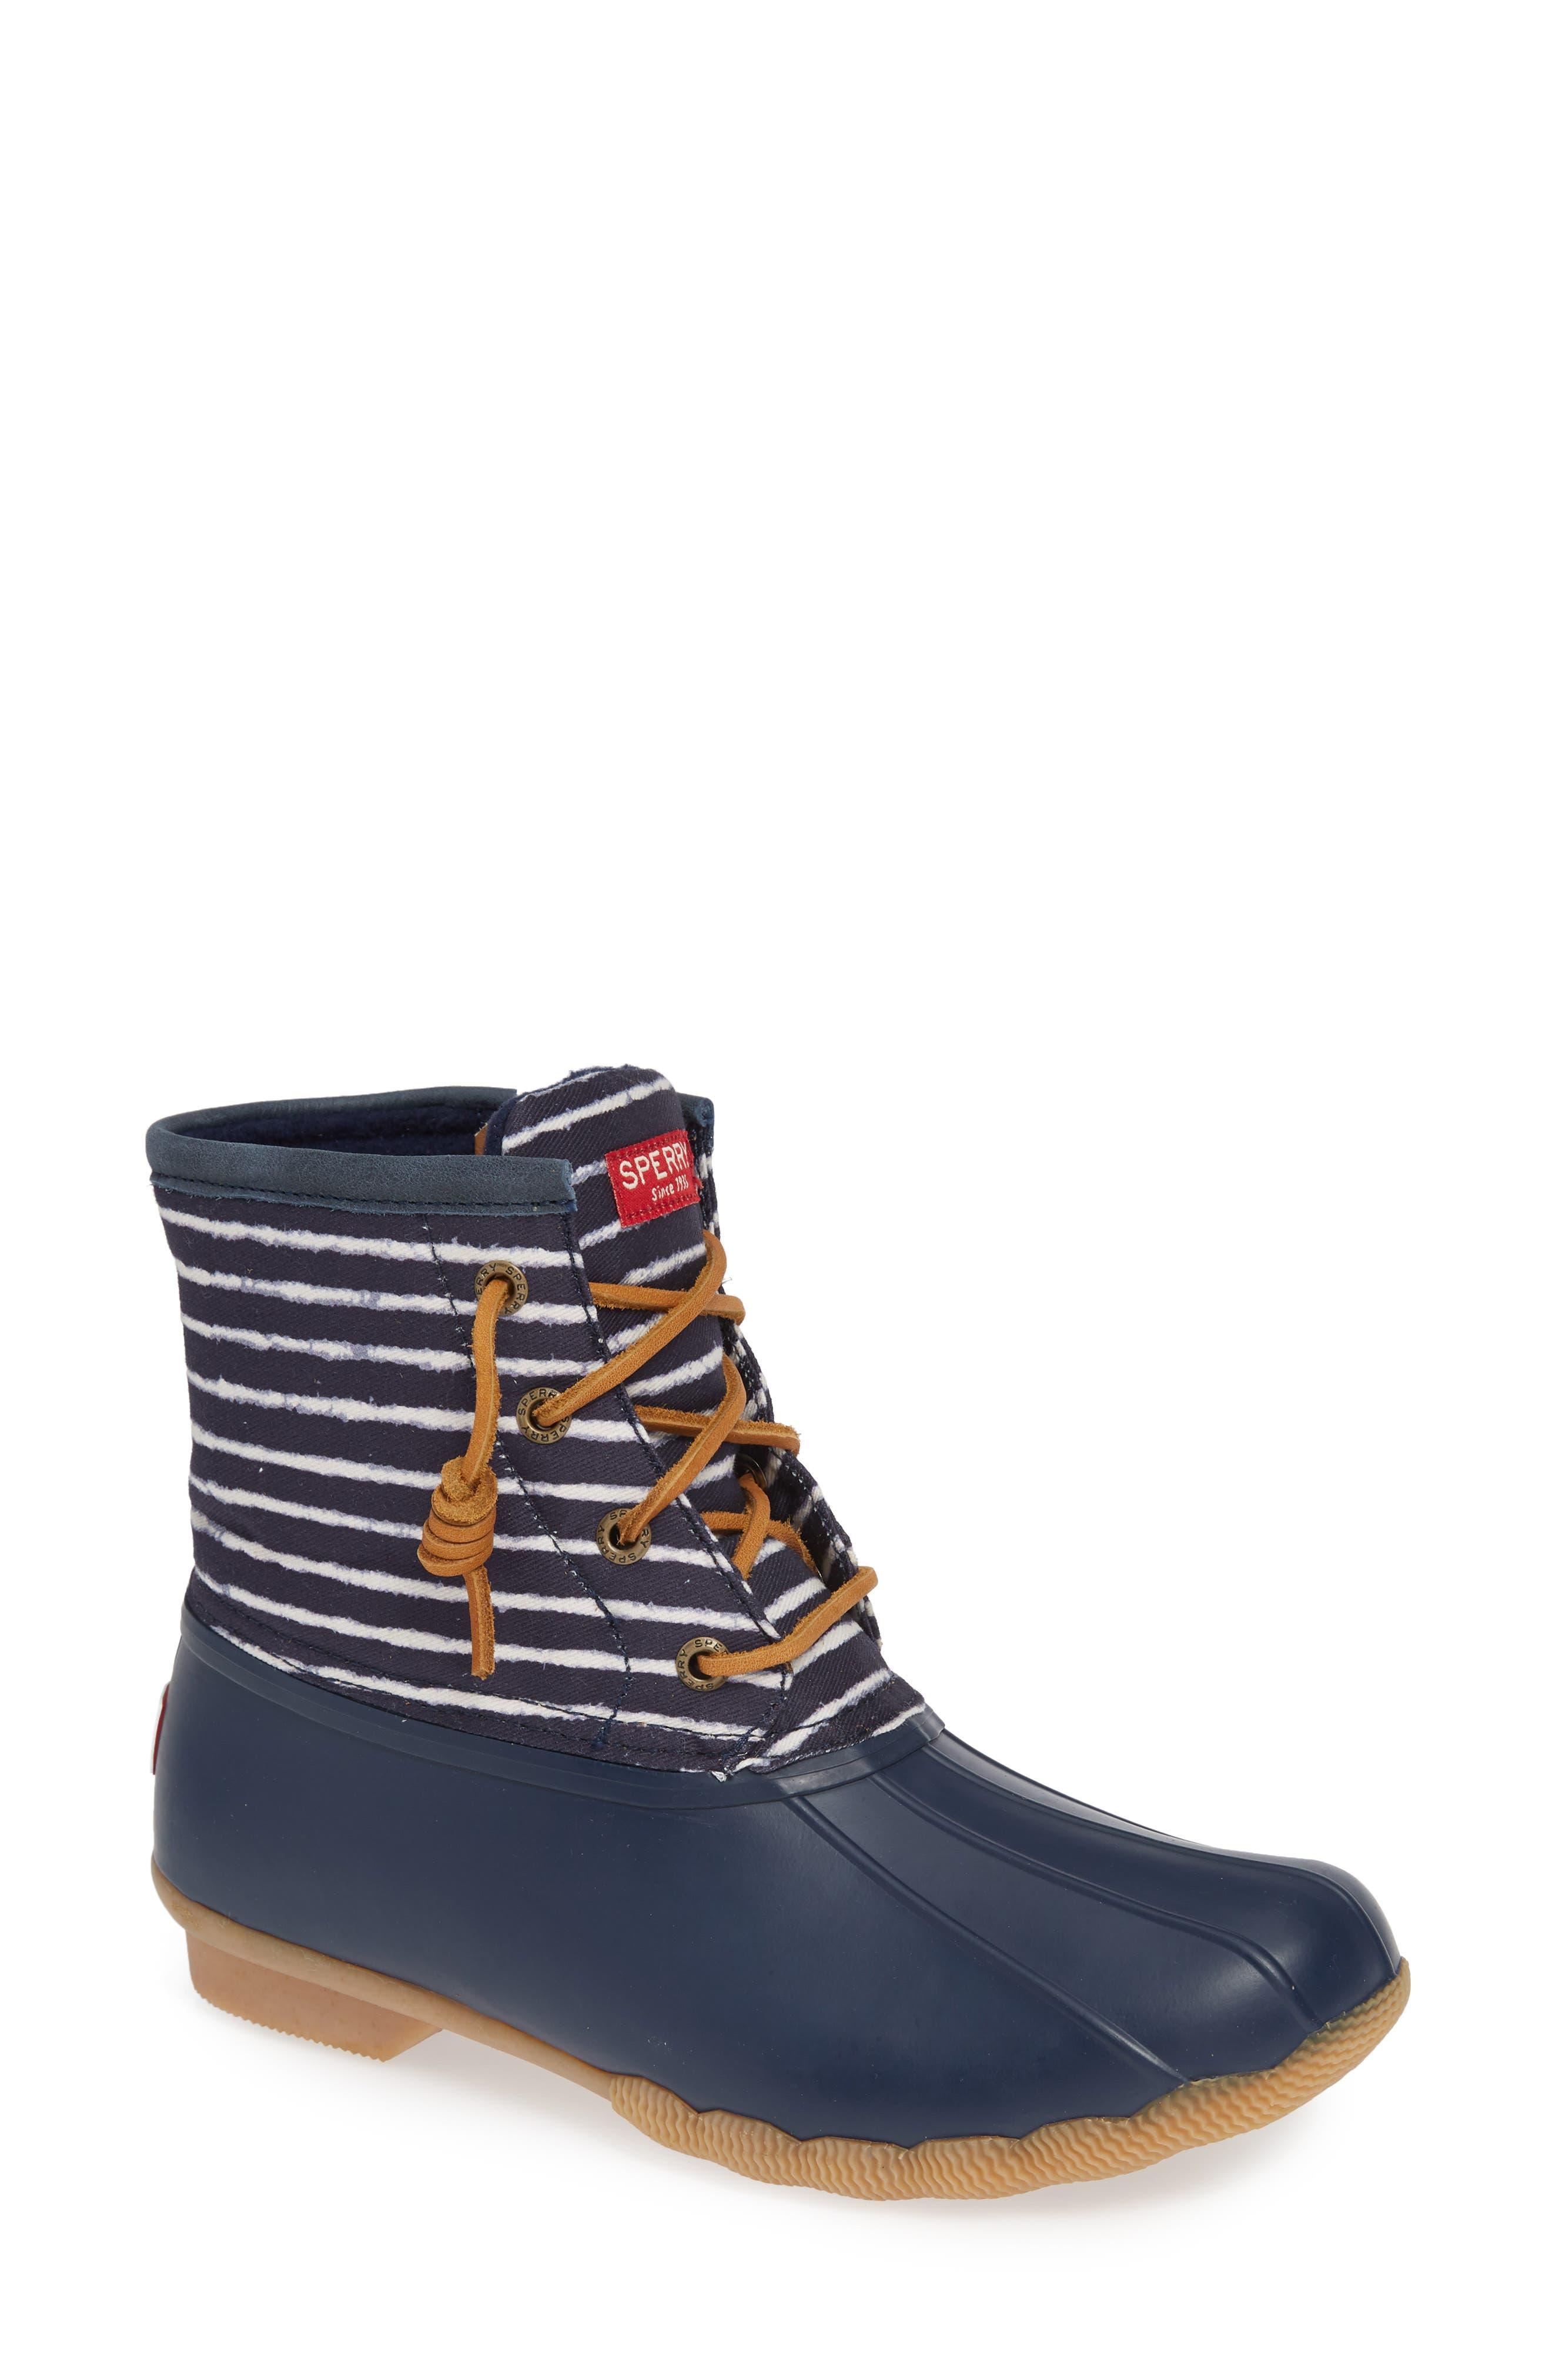 Saltwater Waterproof Rain Boot,                         Main,                         color, NAVY FABRIC